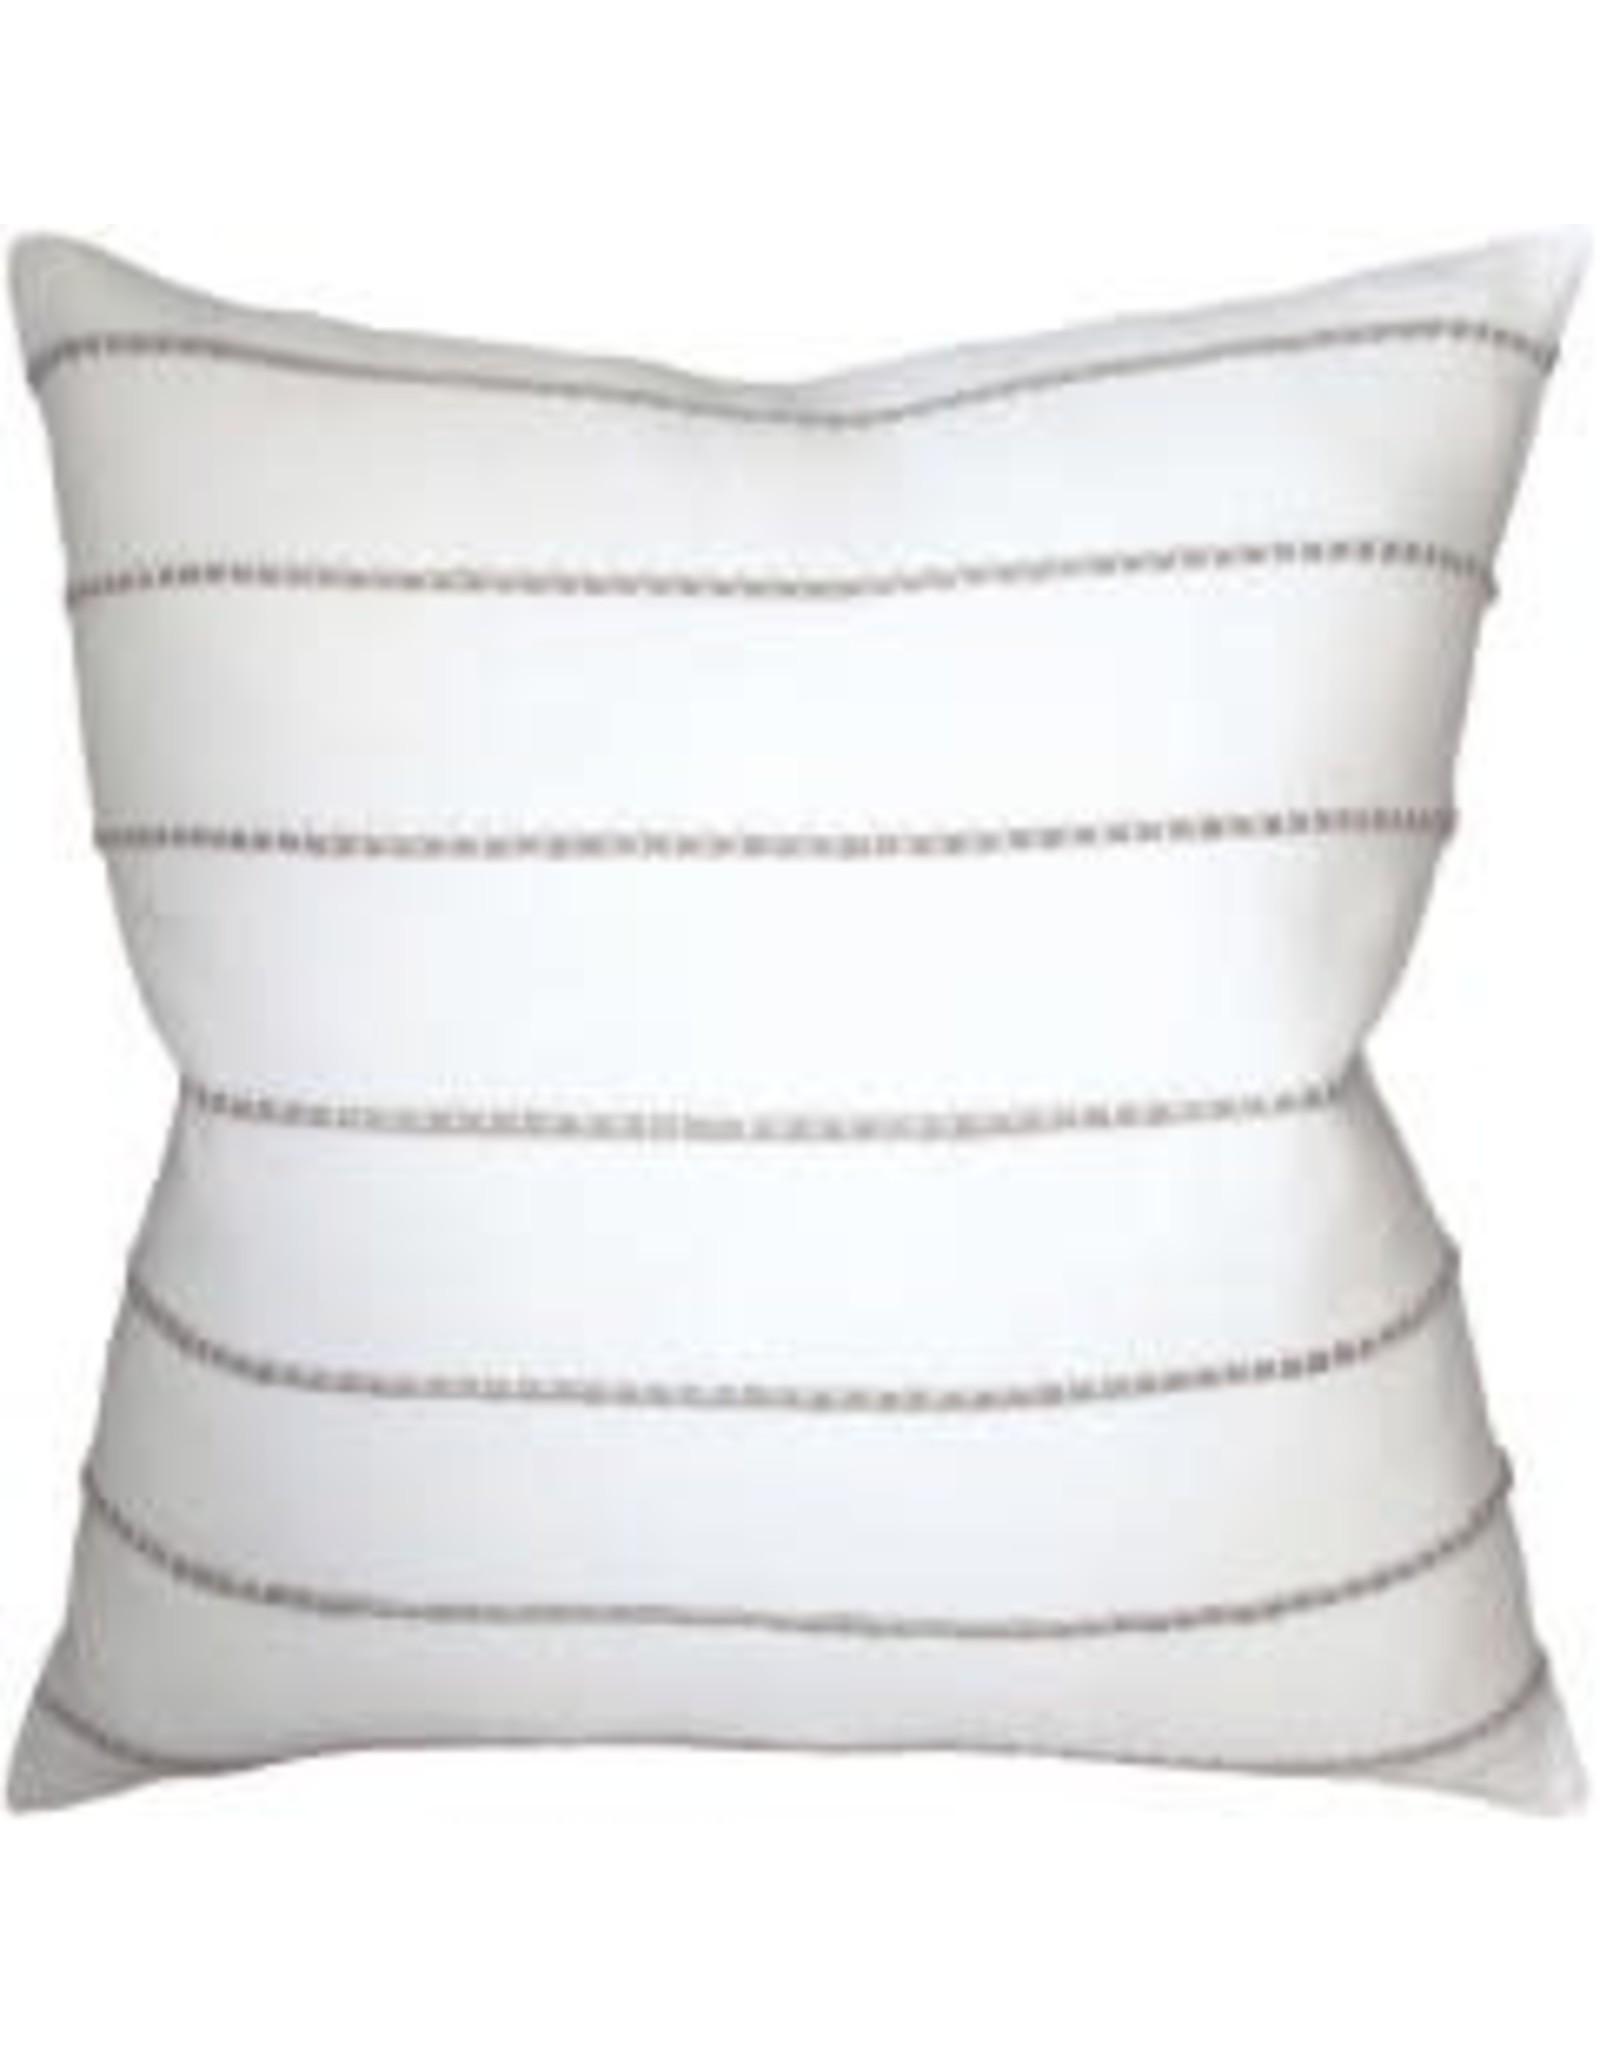 "Sonjamb Jute Straw Pillow 22"""